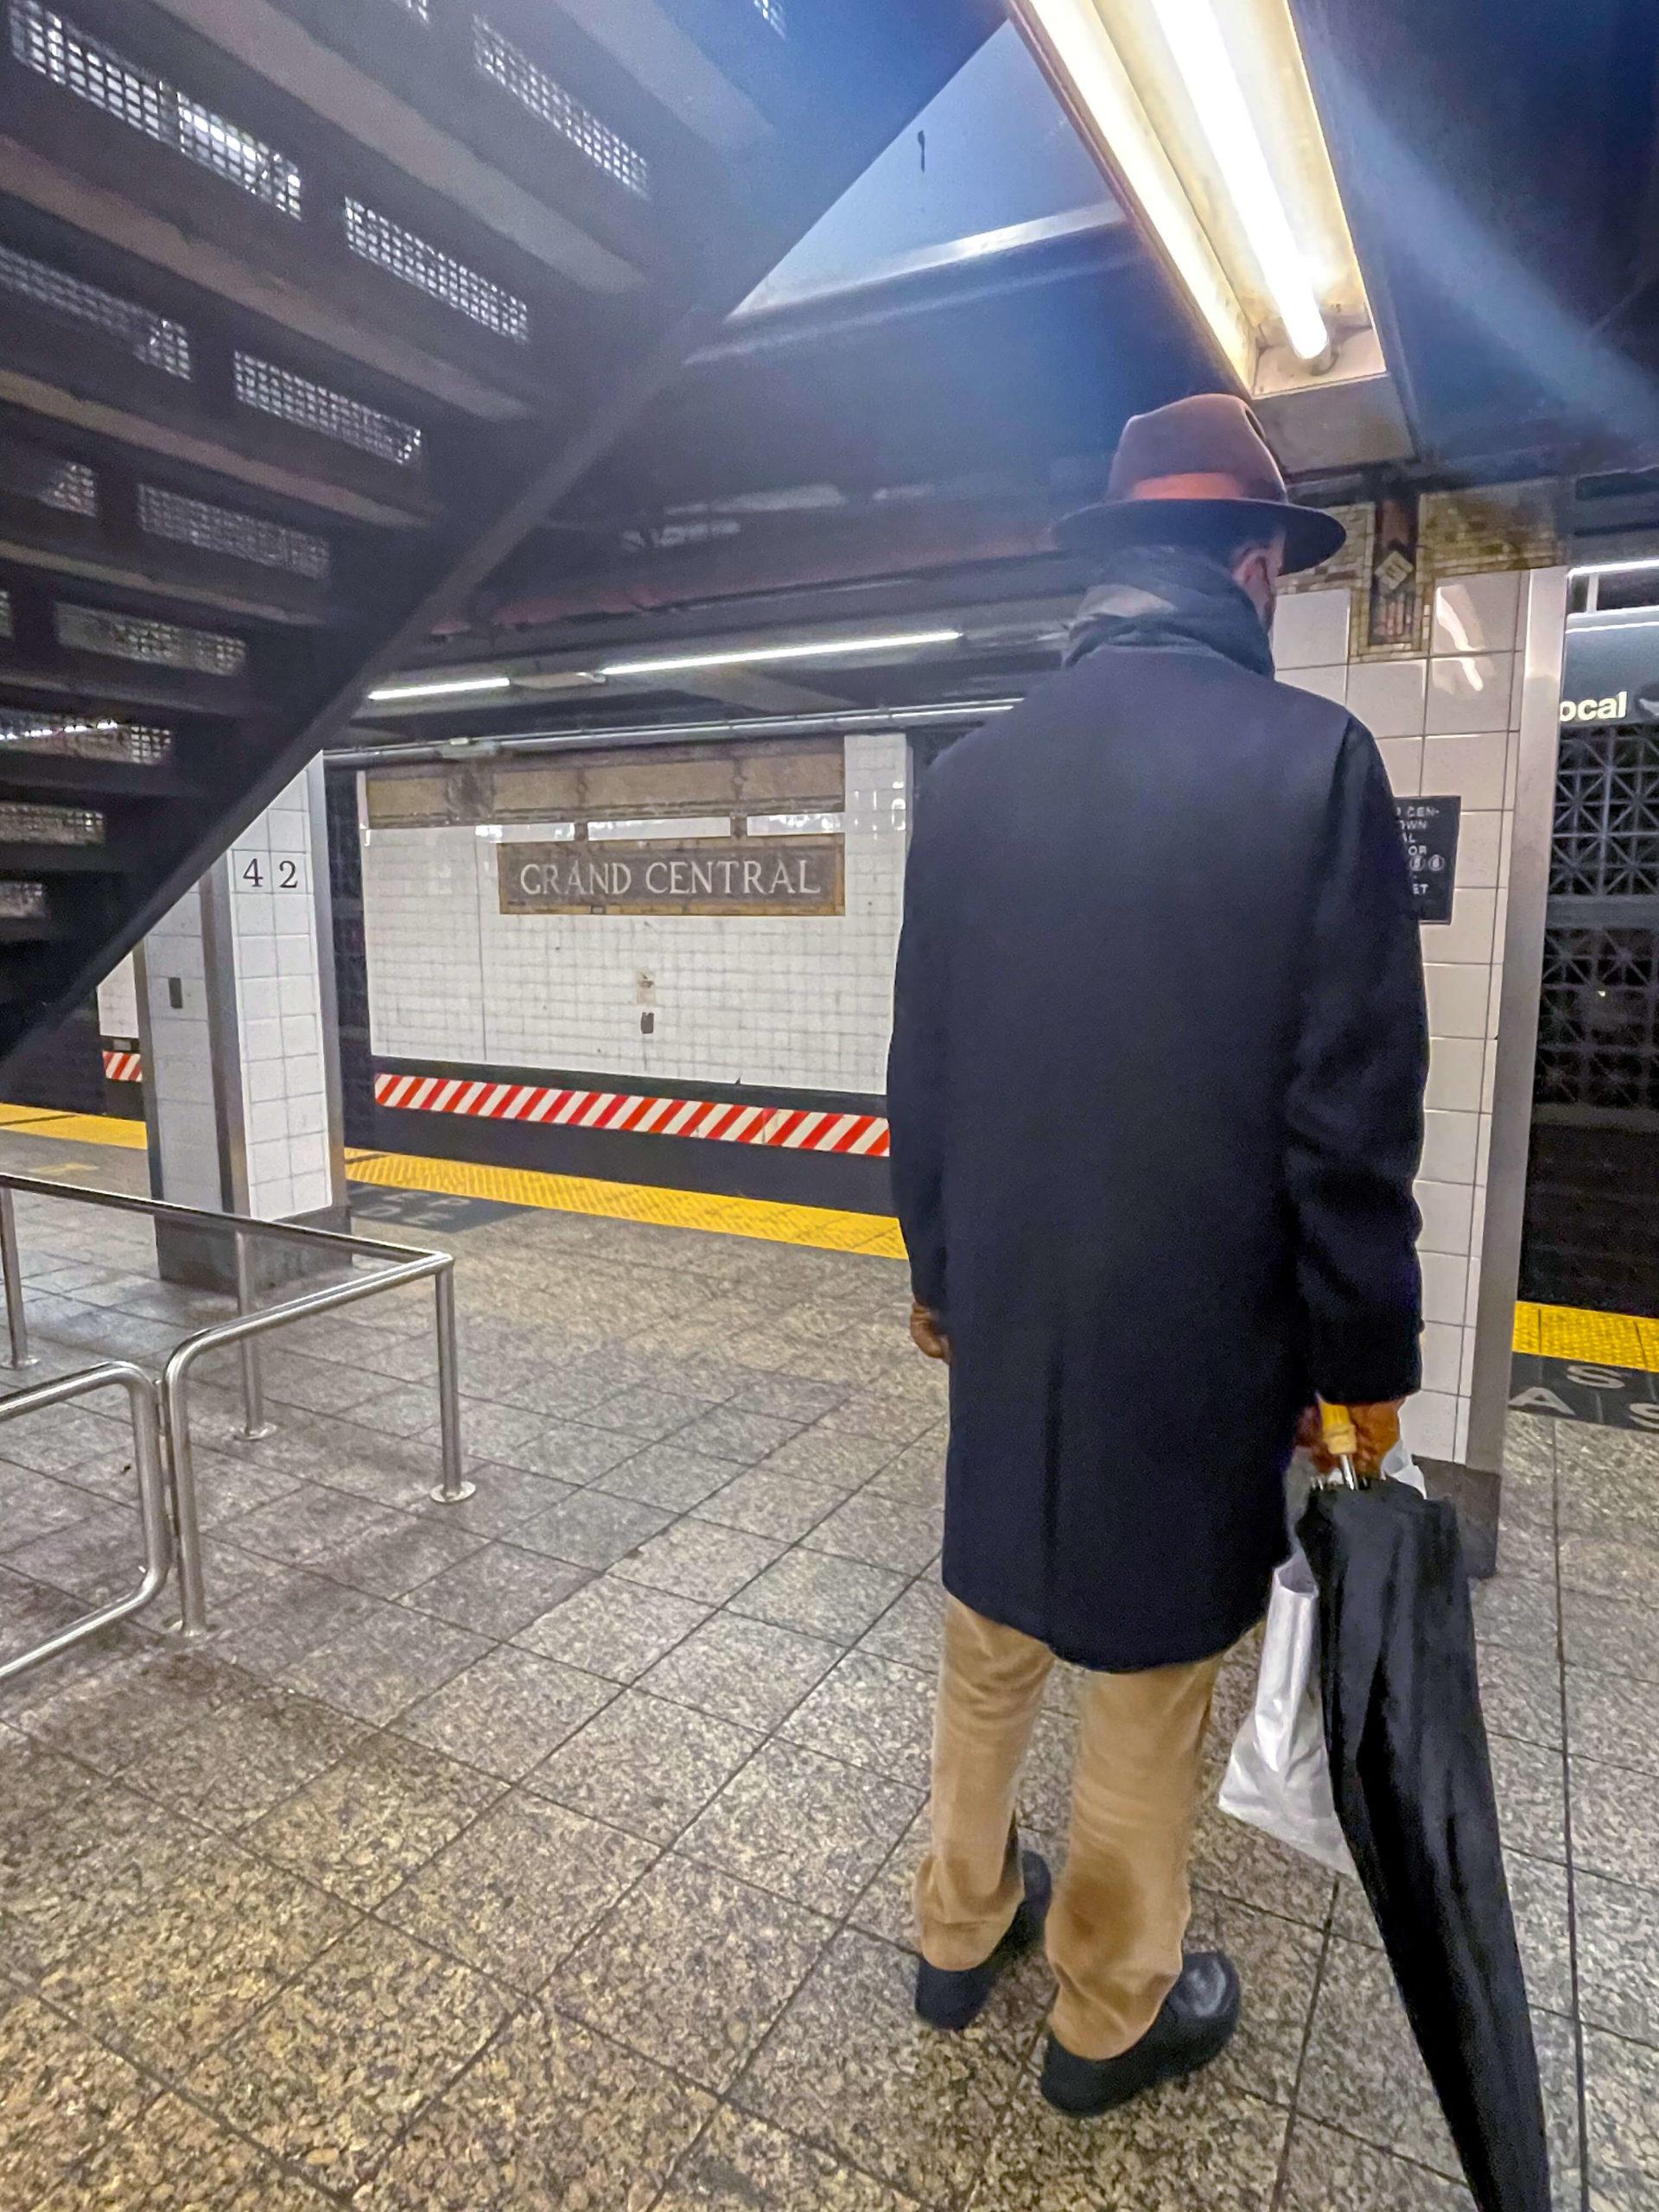 cartelli della metropolitana a New York